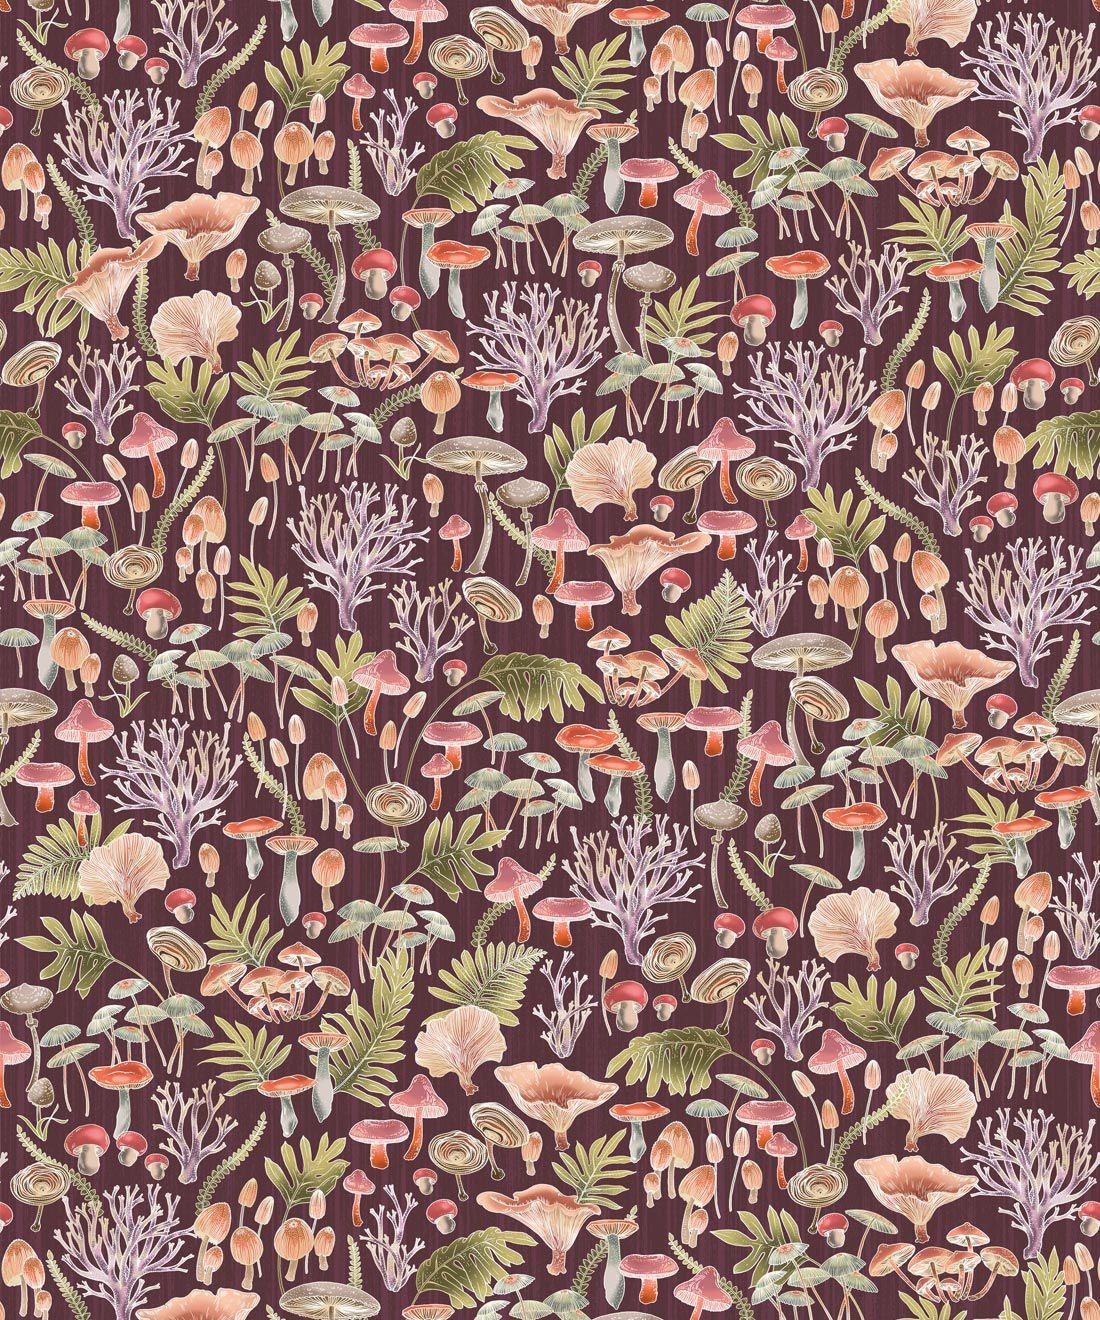 Fungi Wallpaper • Eloise Short • Vintage Floral Wallpaper •Granny Chic Wallpaper • Grandmillennial Style Wallpaper •Wine •Swatch